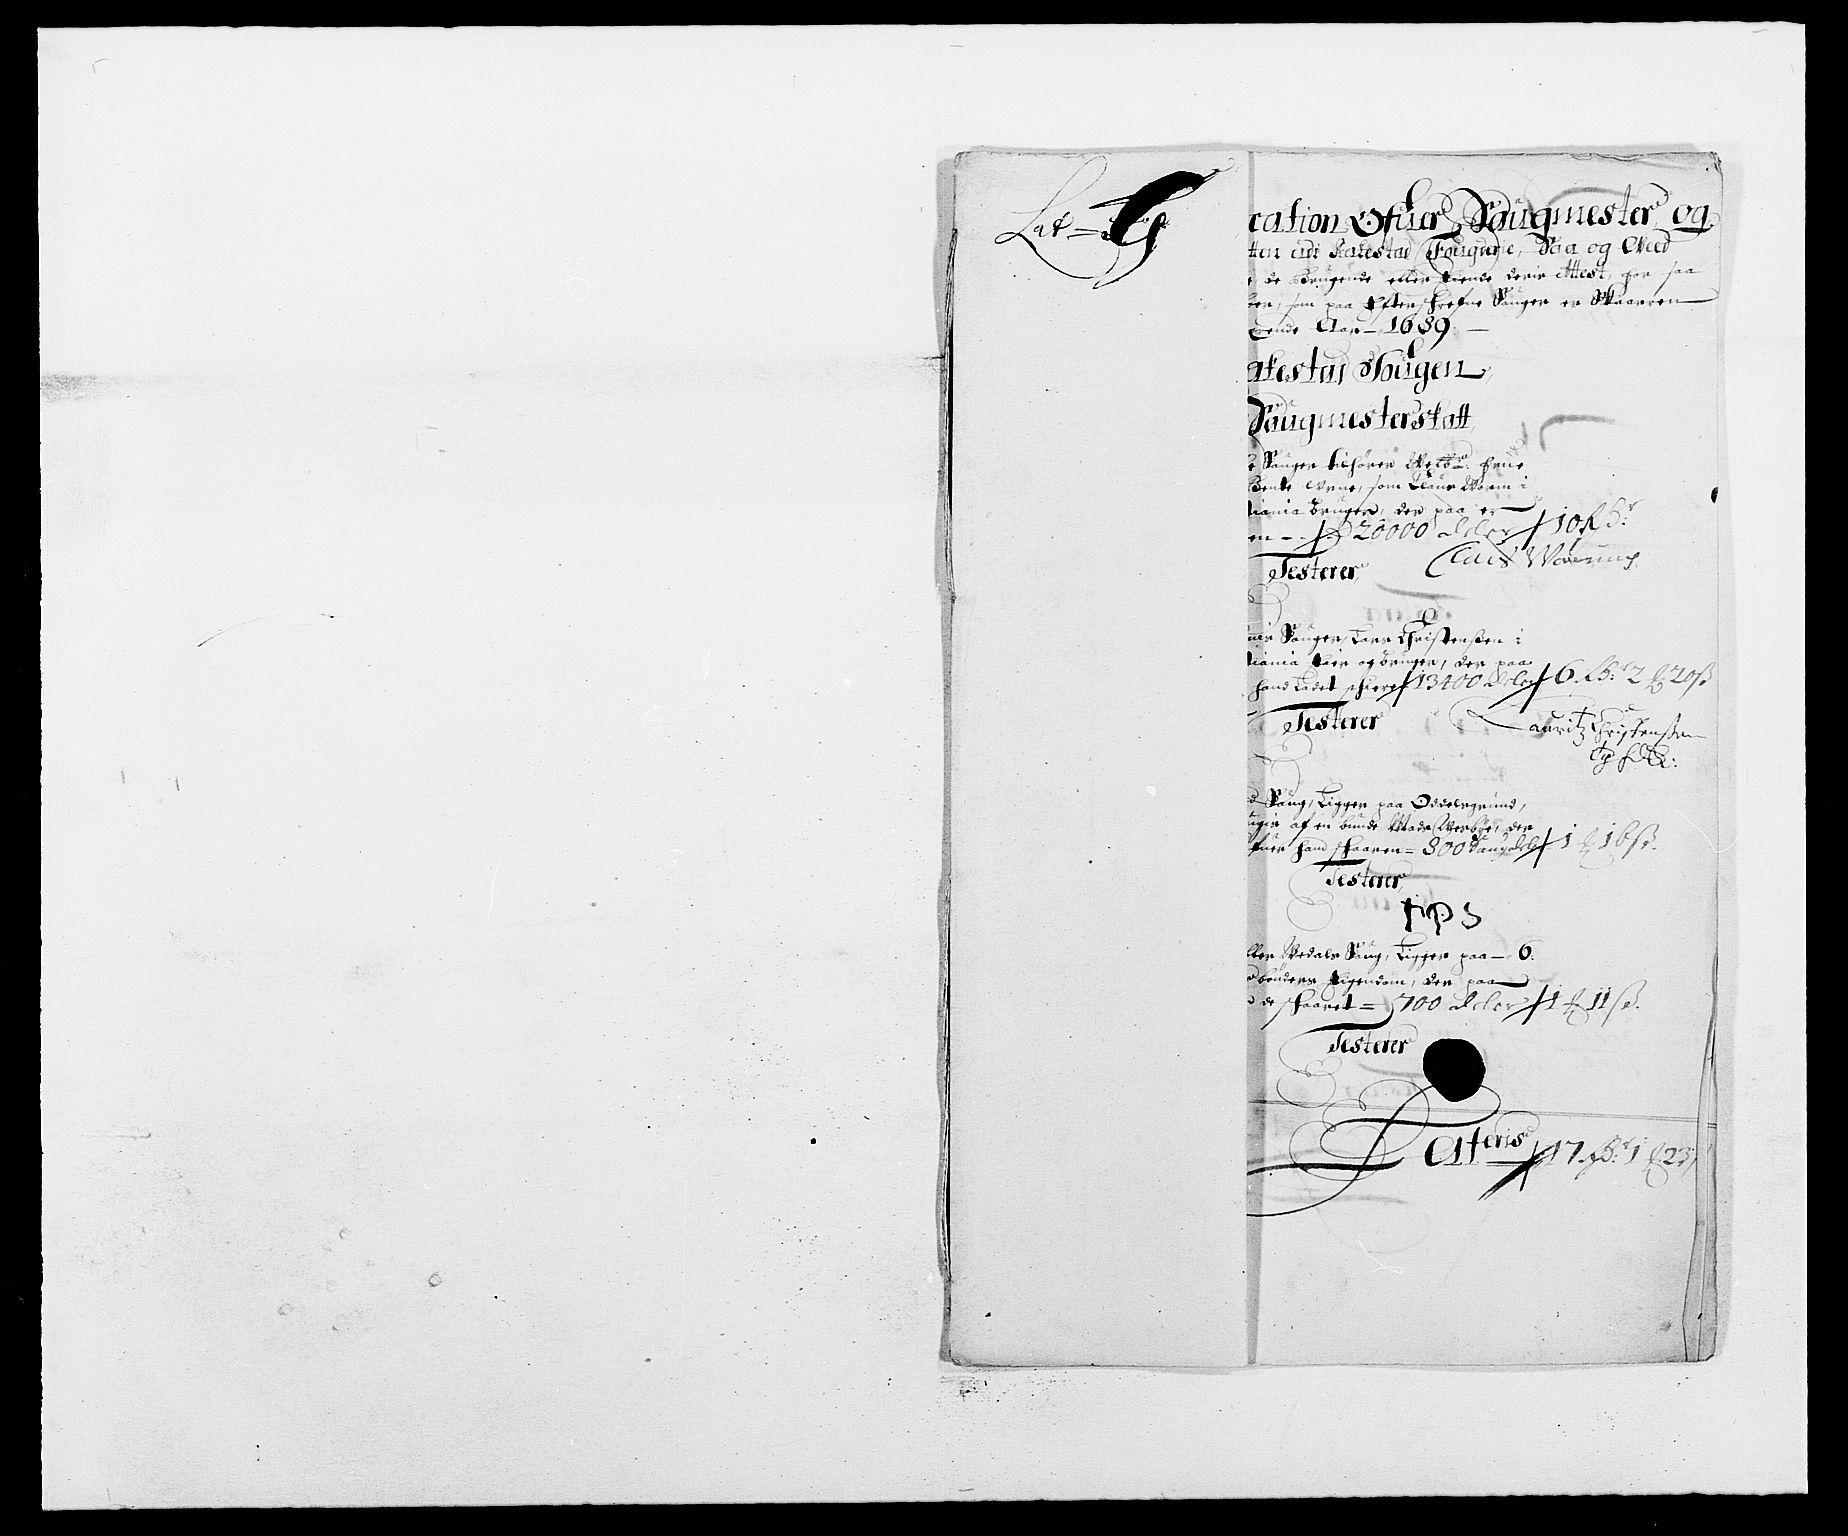 RA, Rentekammeret inntil 1814, Reviderte regnskaper, Fogderegnskap, R05/L0277: Fogderegnskap Rakkestad, 1689-1690, s. 150